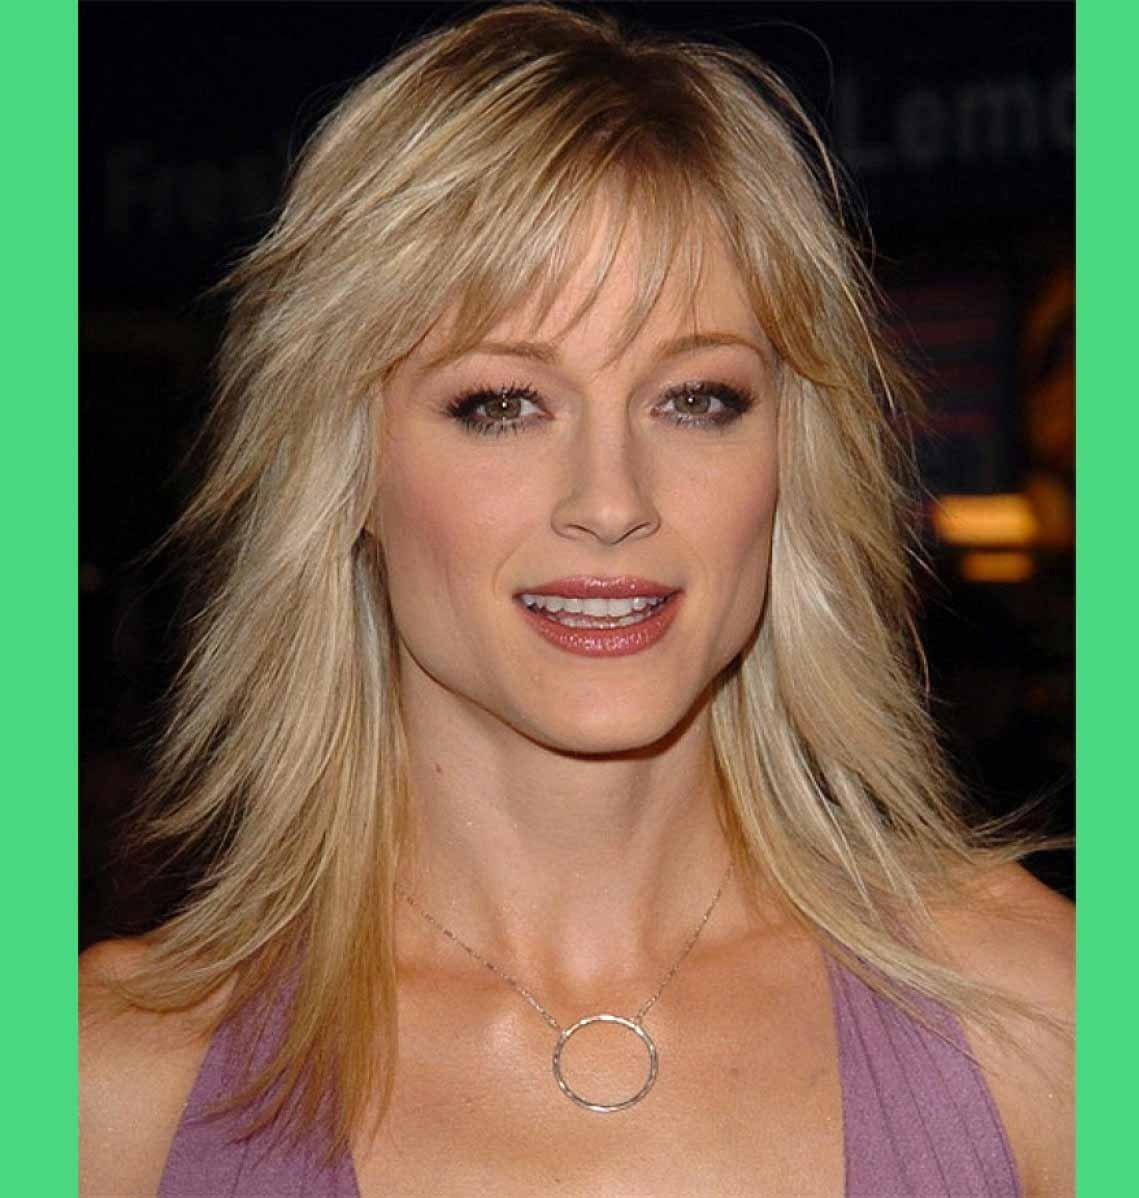 10 Ideal Bang Ideas For Medium Hair hairstyles with fringes for medium length hair hairstyle for women